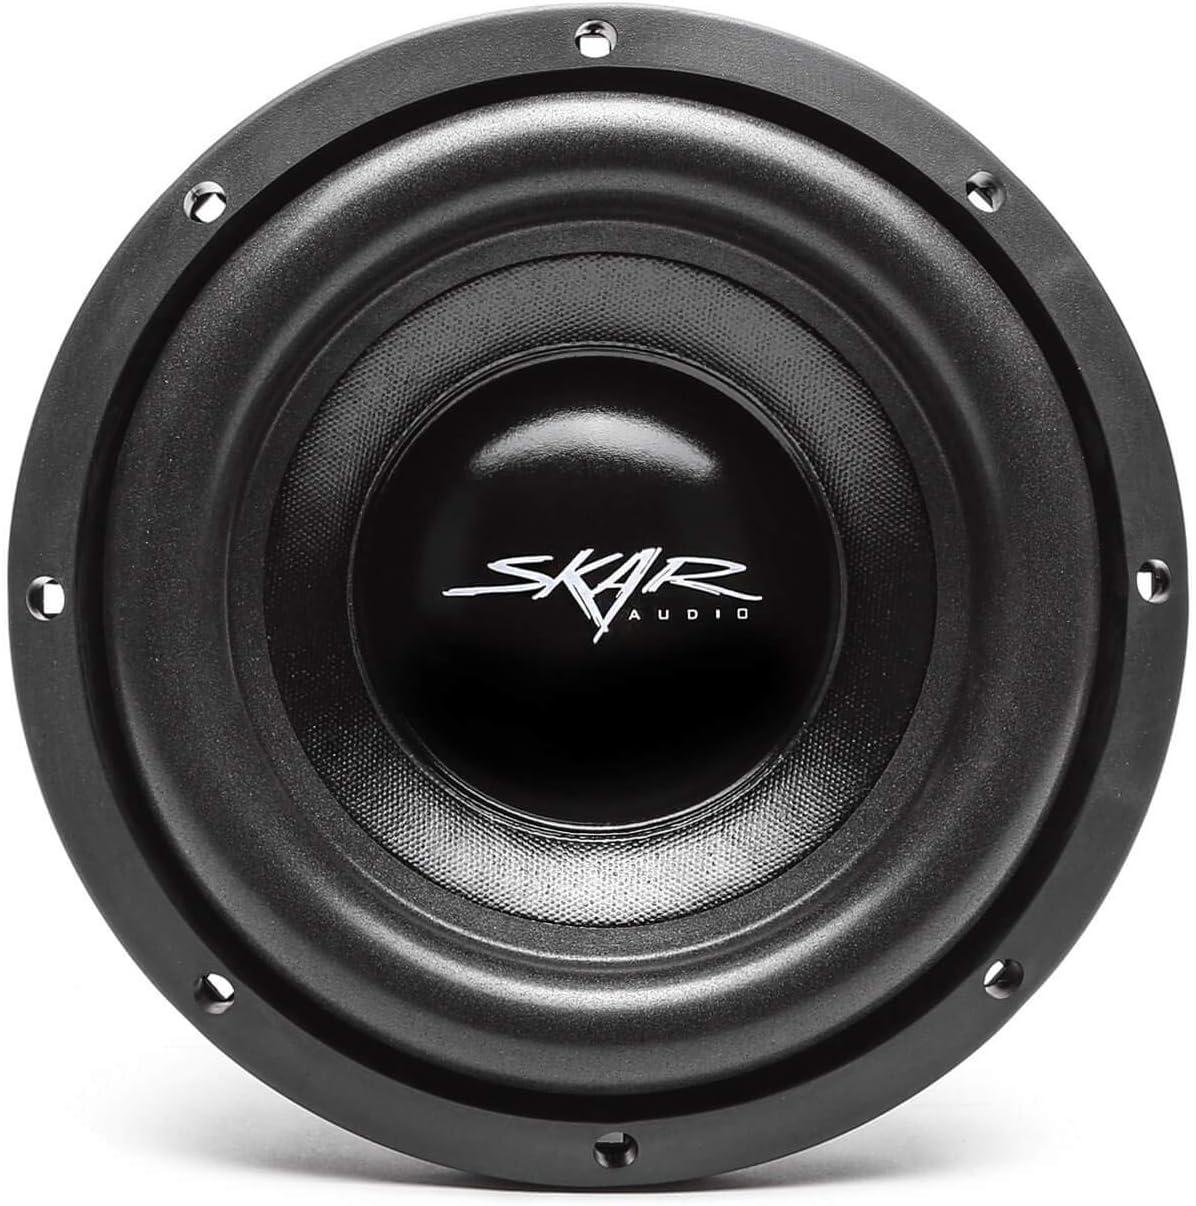 Pair of 2 2 Skar Audio IX-8 D4 8 300W Max Power Dual 4 Ohm Car Subwoofers